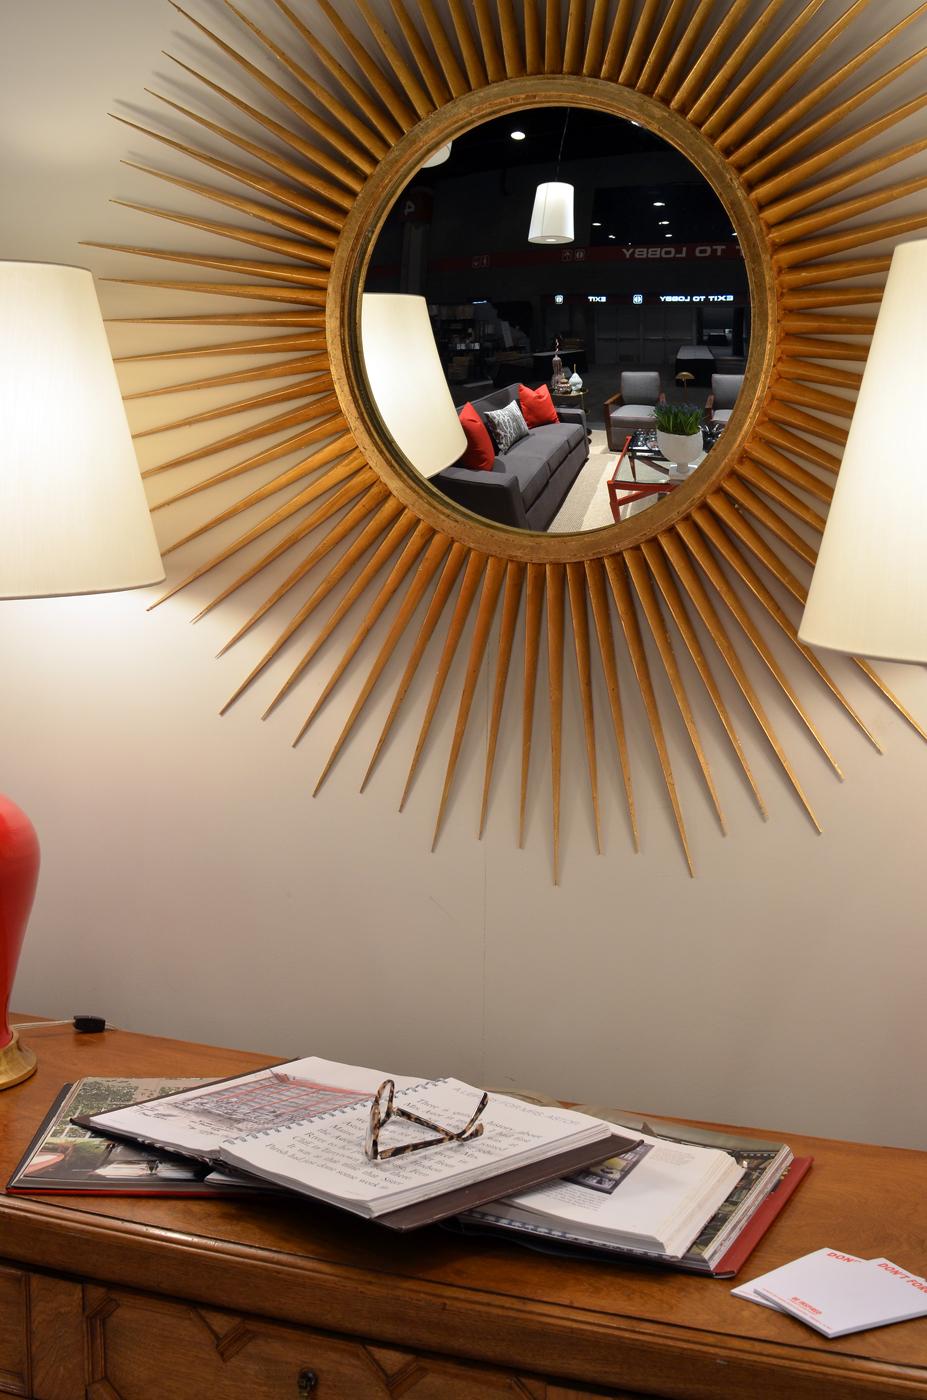 Gold sunburst decorative mirror over antique console table   Savage Interior Design